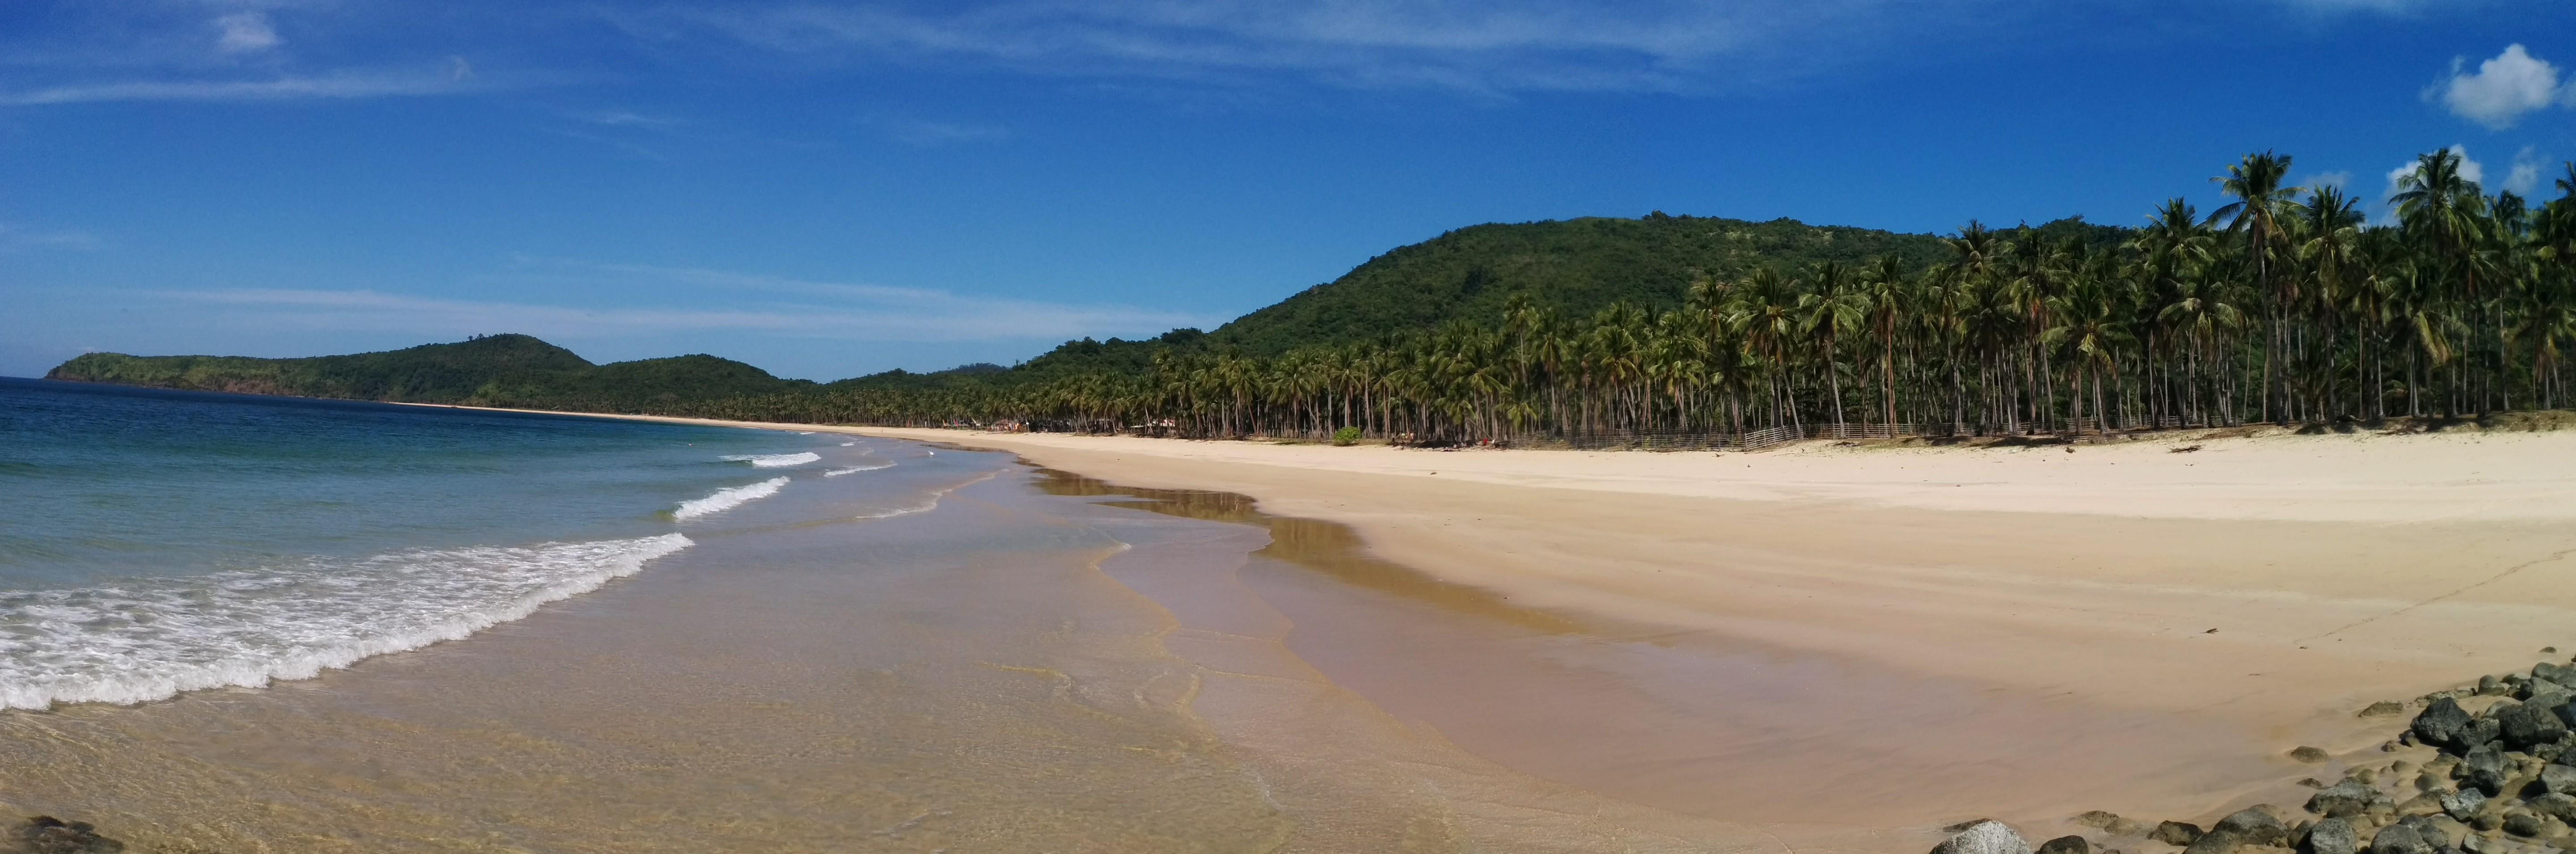 File:El Nido - Nacpan Beach.jpg - Wikimedia Commons